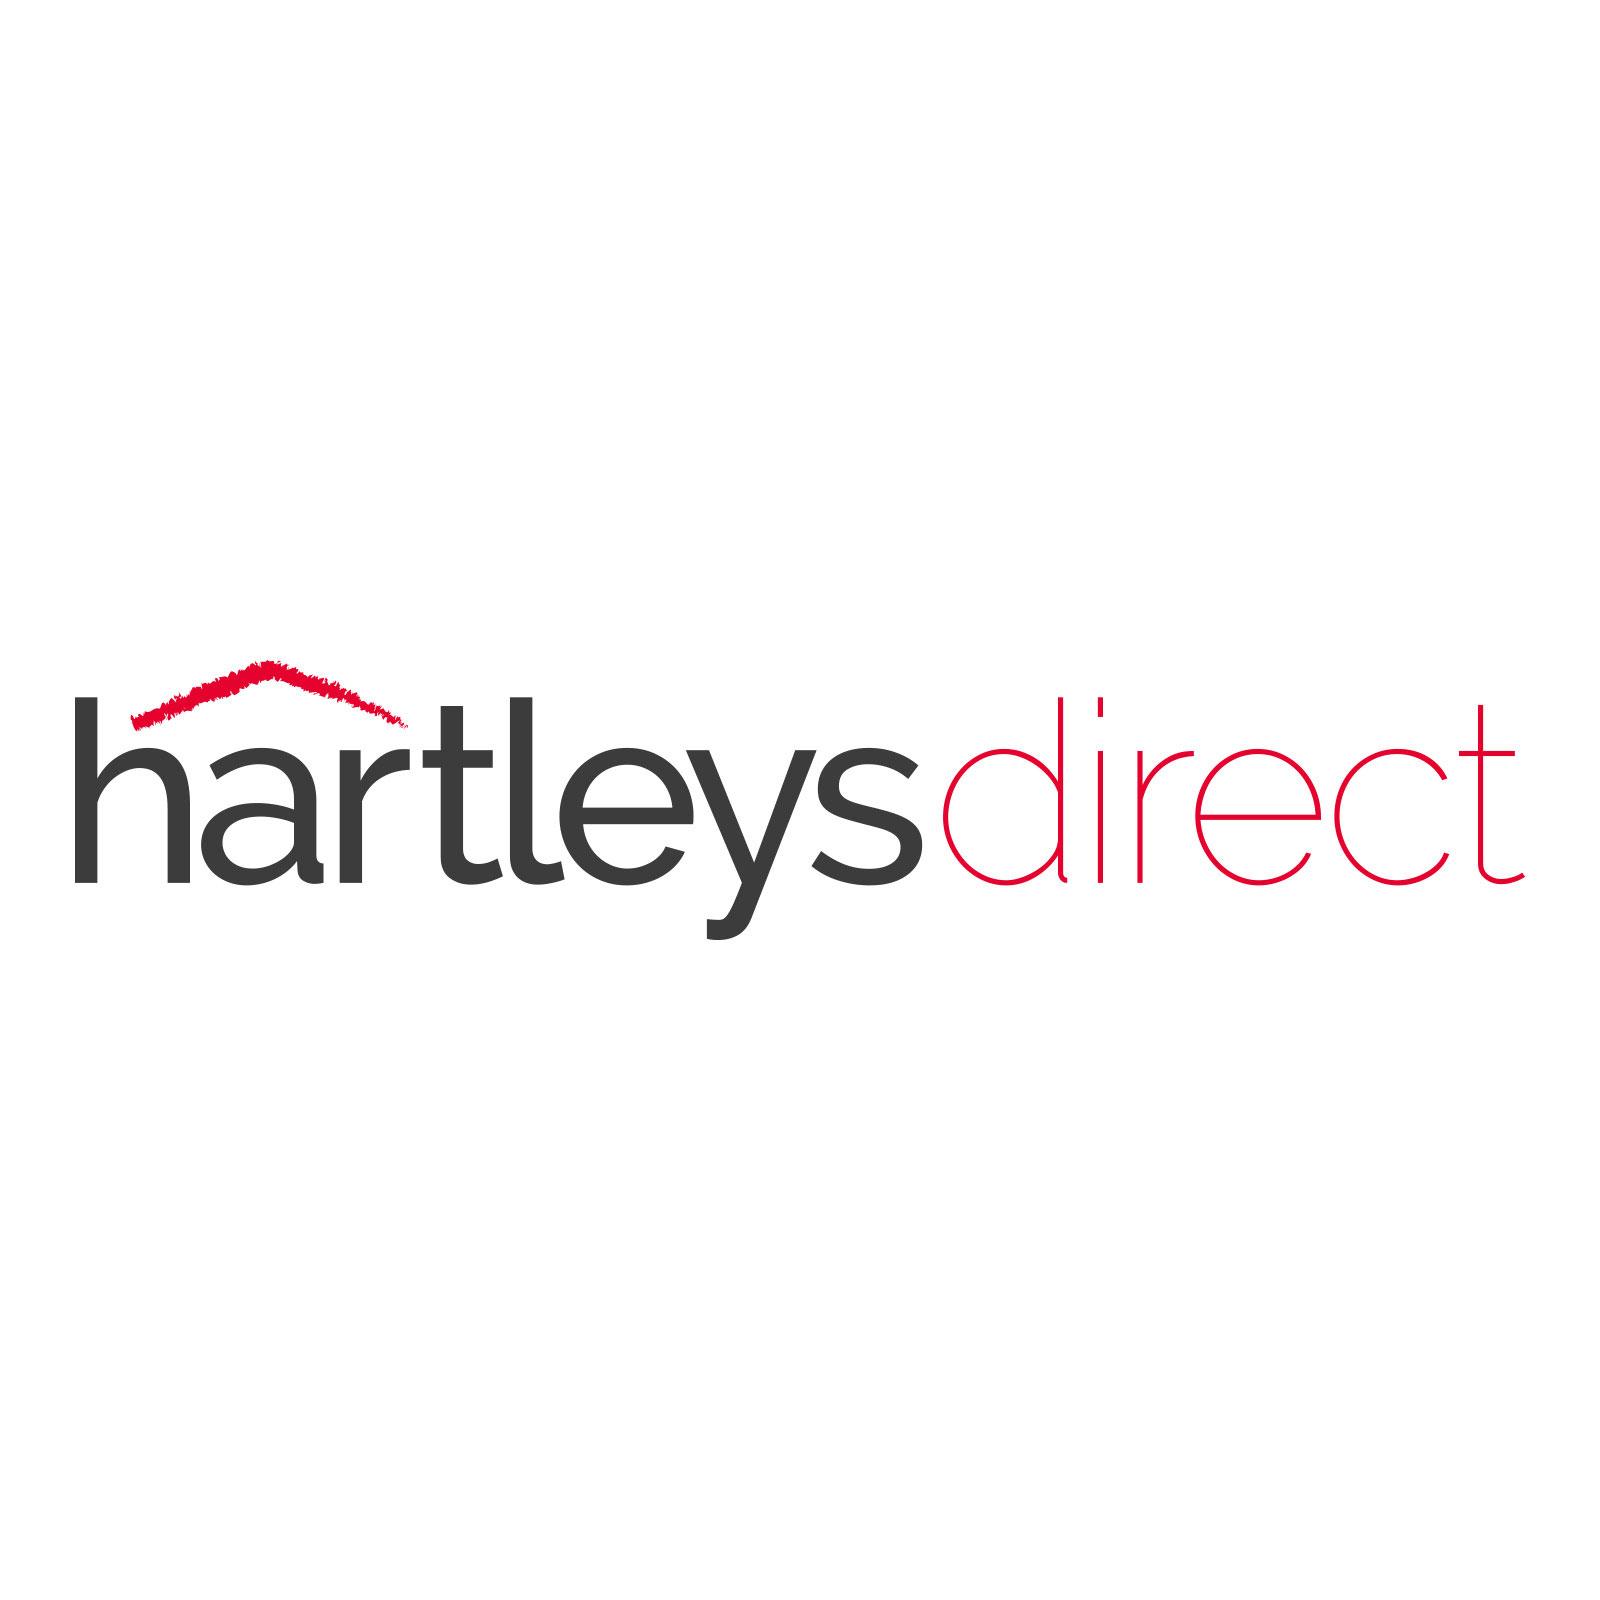 Hartleys-4-Tier-Brown-Folding-Ladder-on-White-Background.jpg